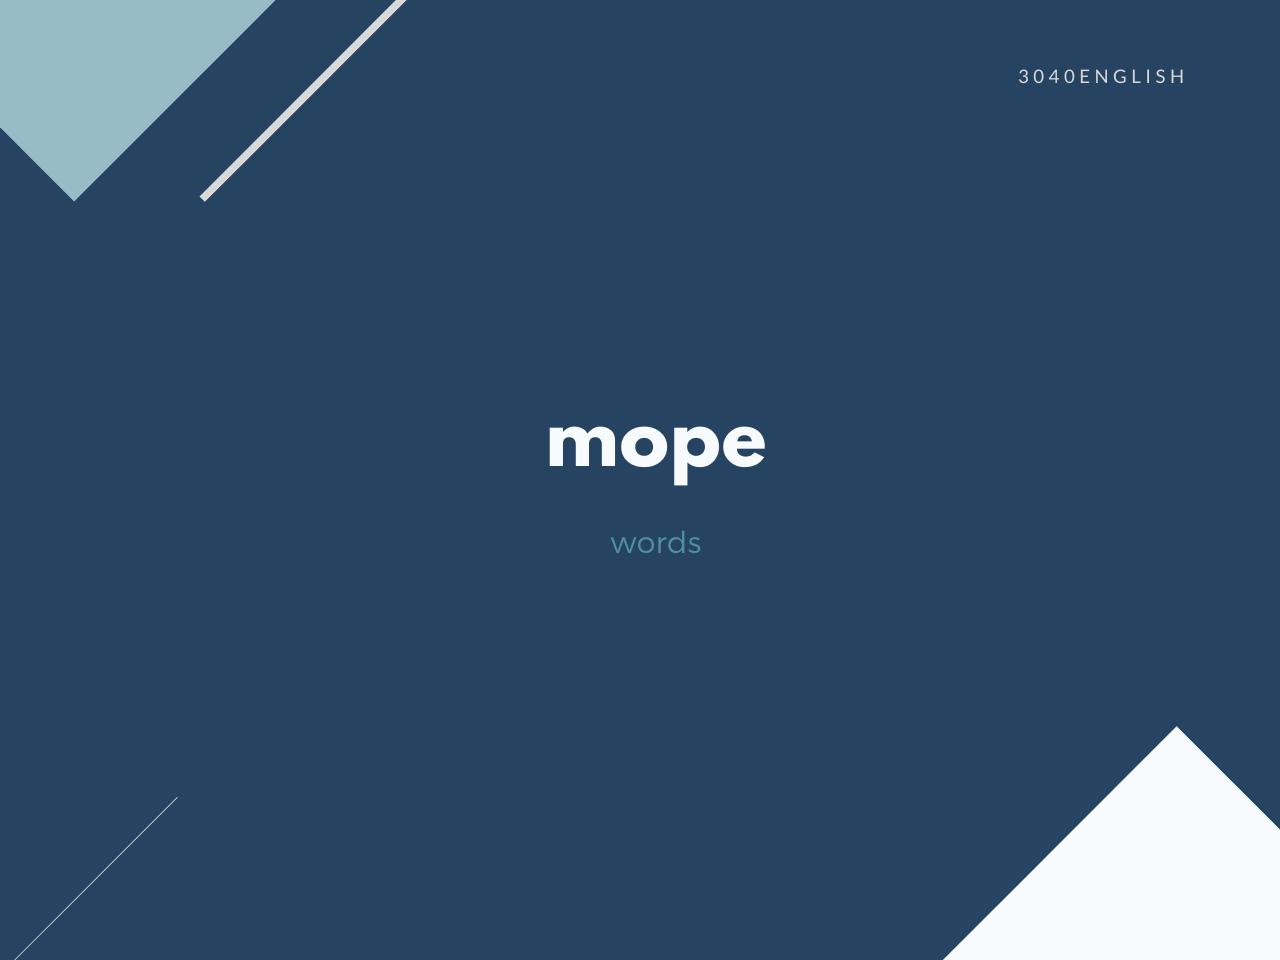 mope の意味と簡単な使い方【音読用例文あり】